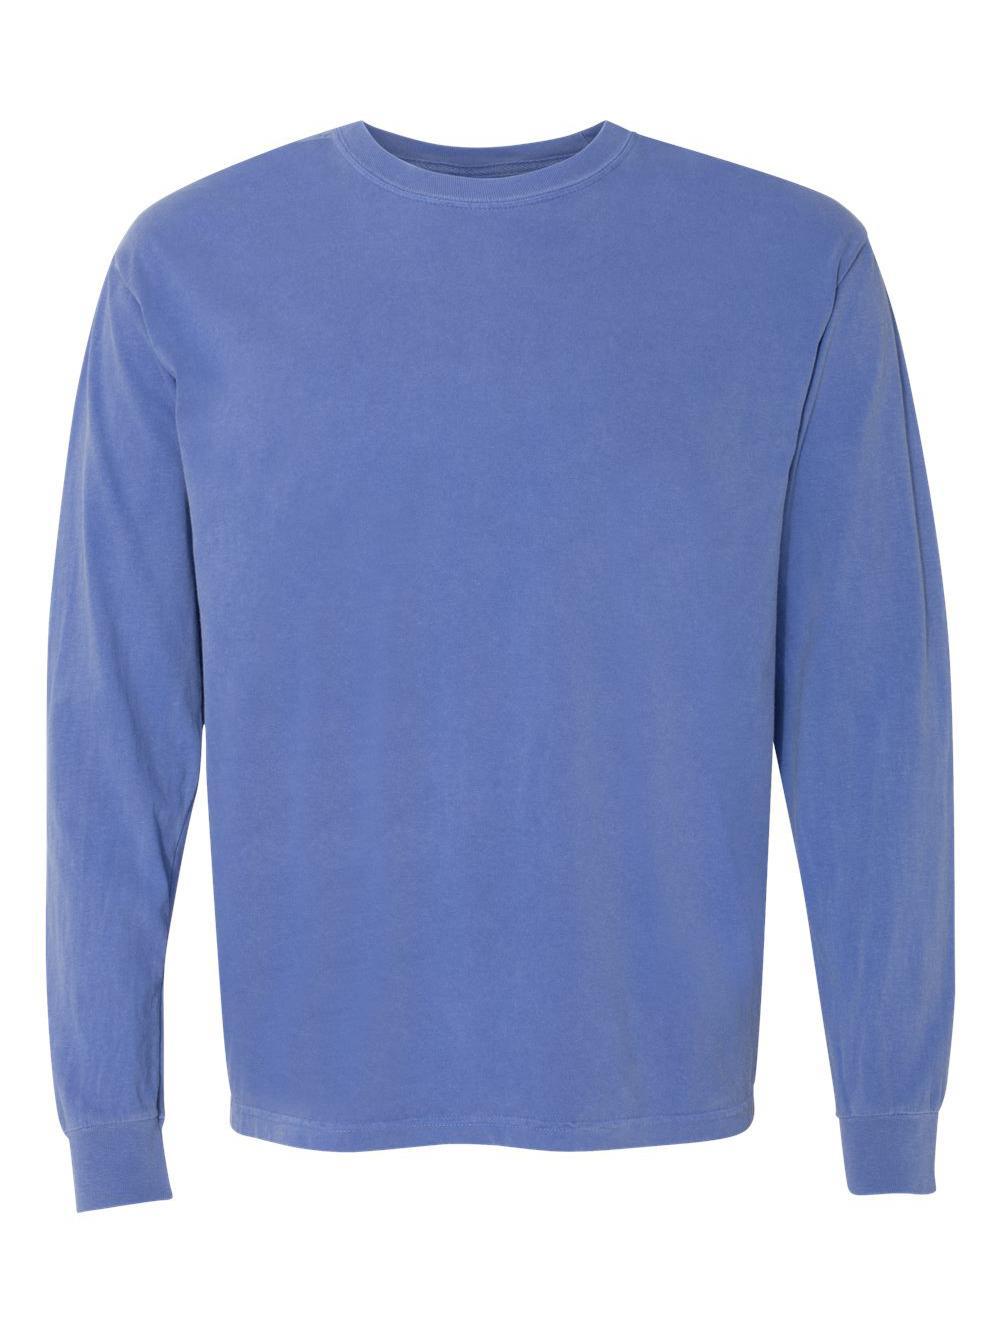 Comfort-Colors-Garment-Dyed-Heavyweight-Ringspun-Long-Sleeve-T-Shirt-6014 thumbnail 33